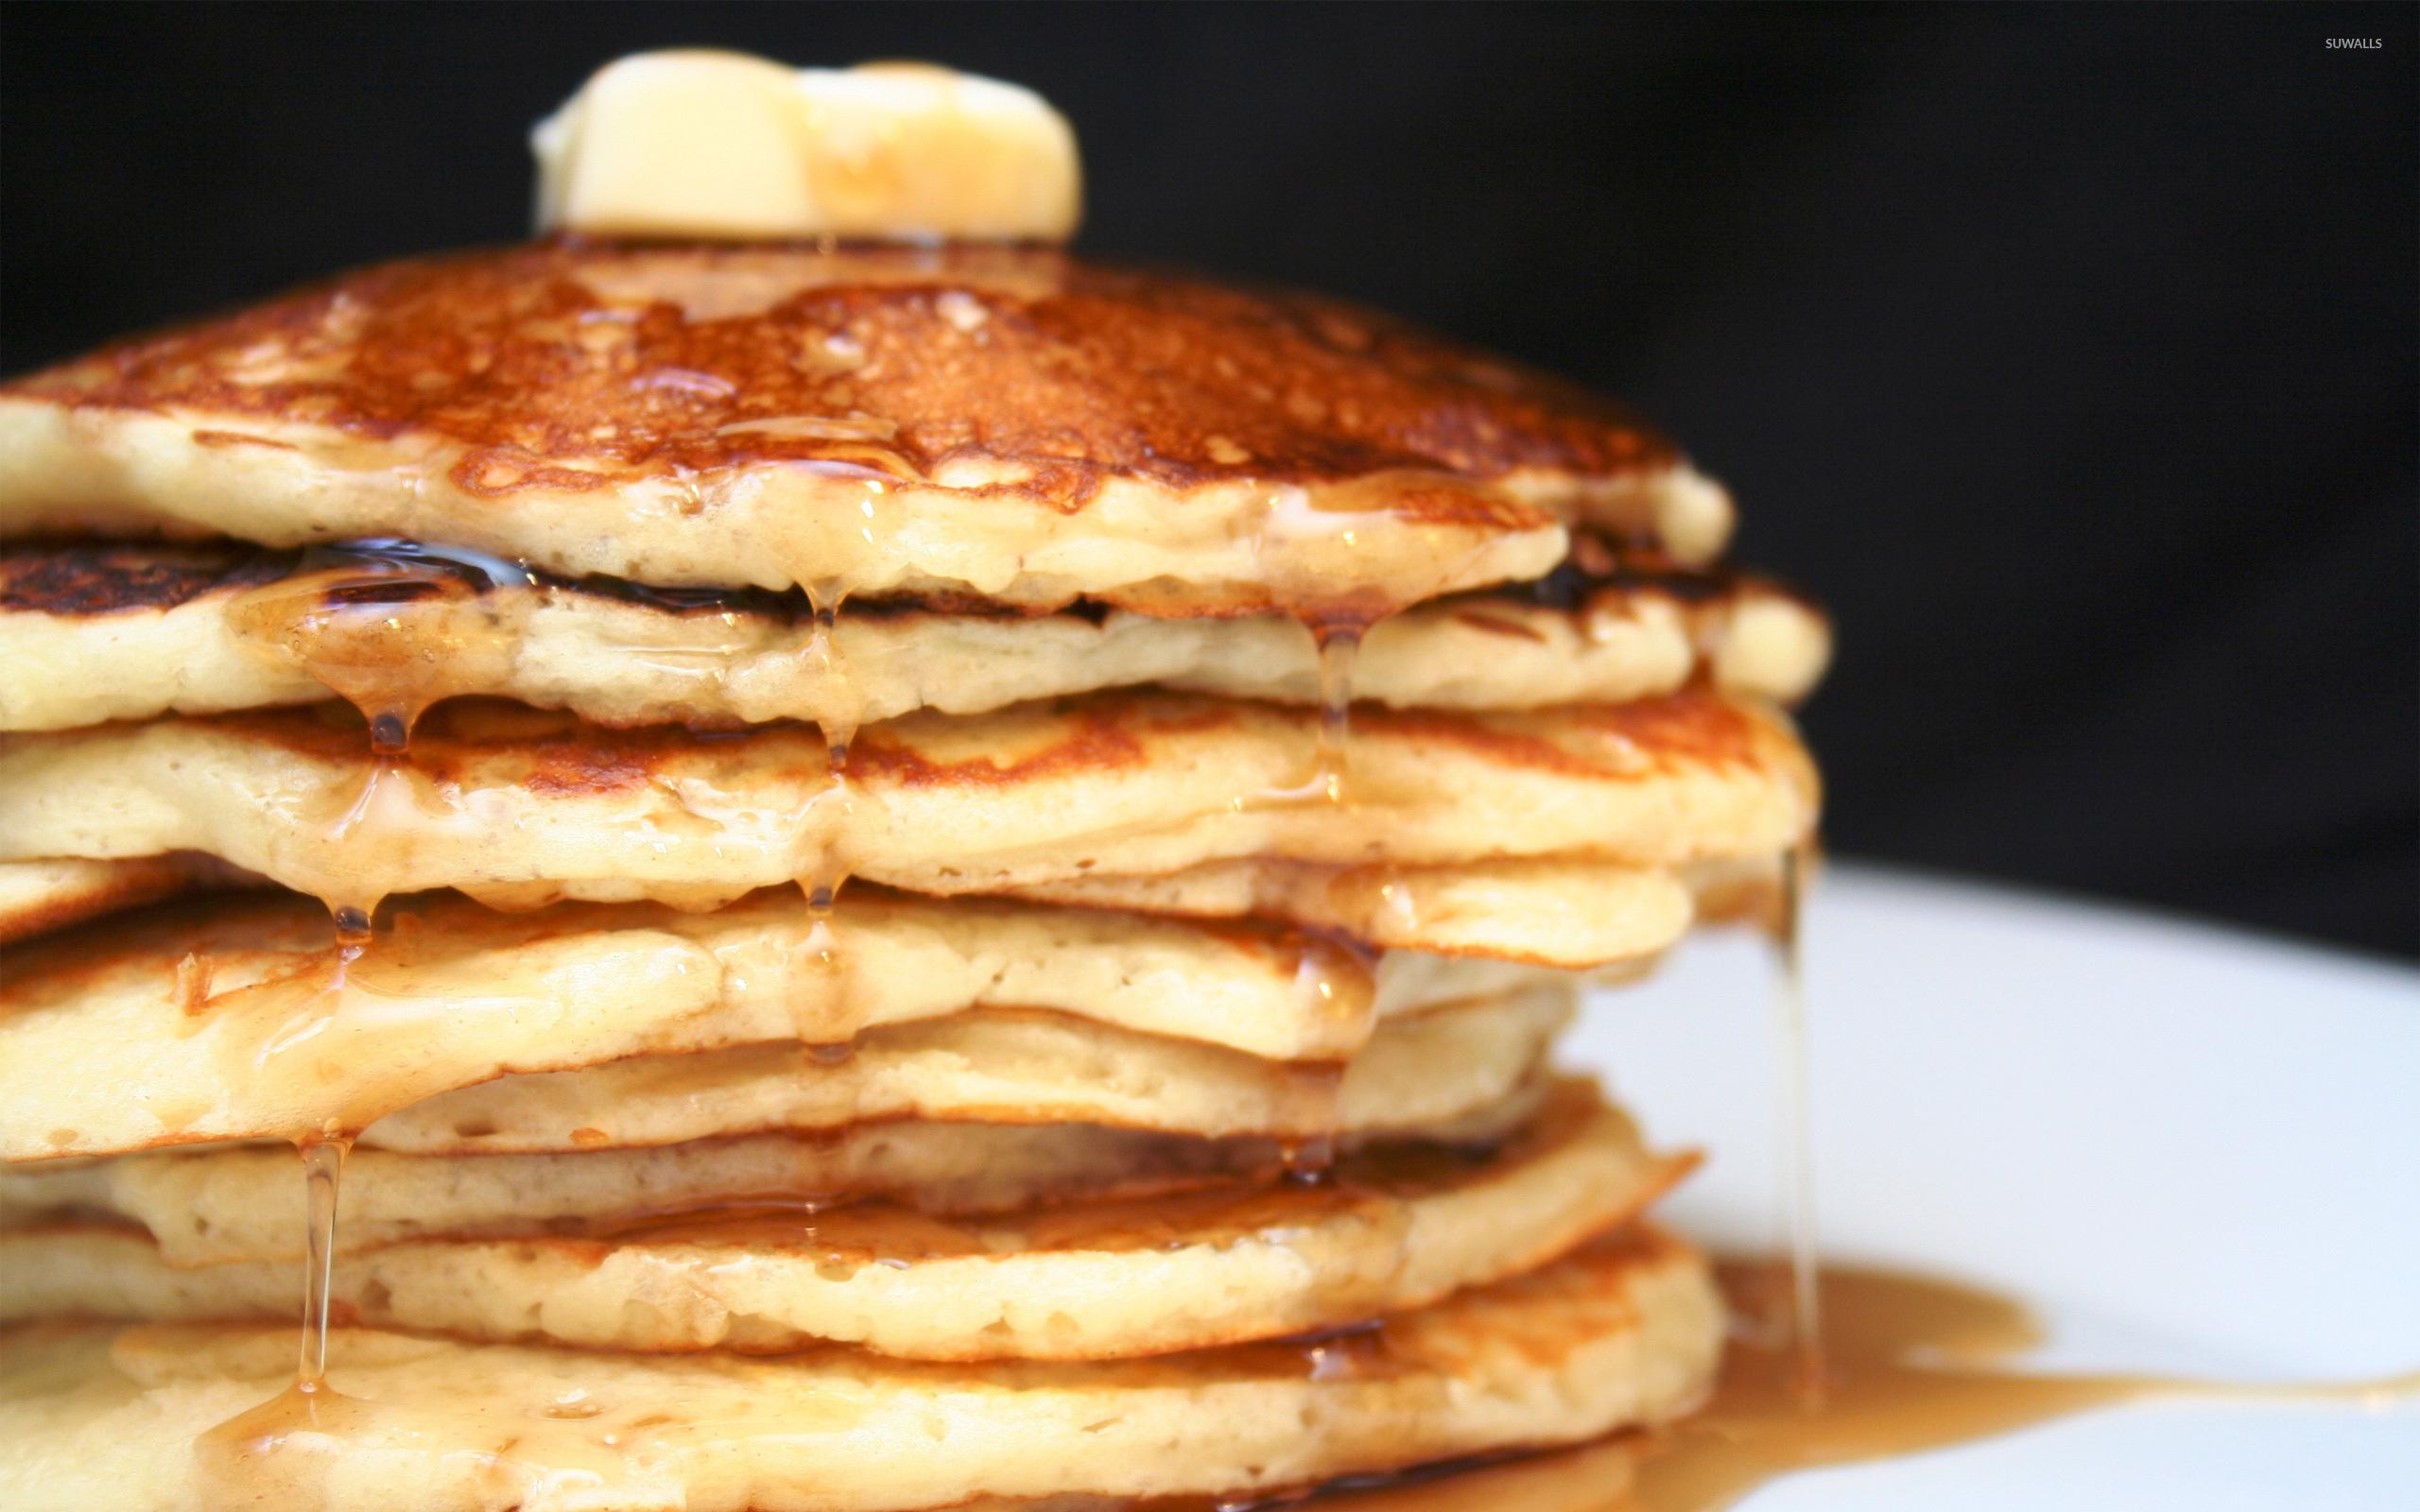 Pancakes wallpaper   Photography wallpapers   6947 2560x1600